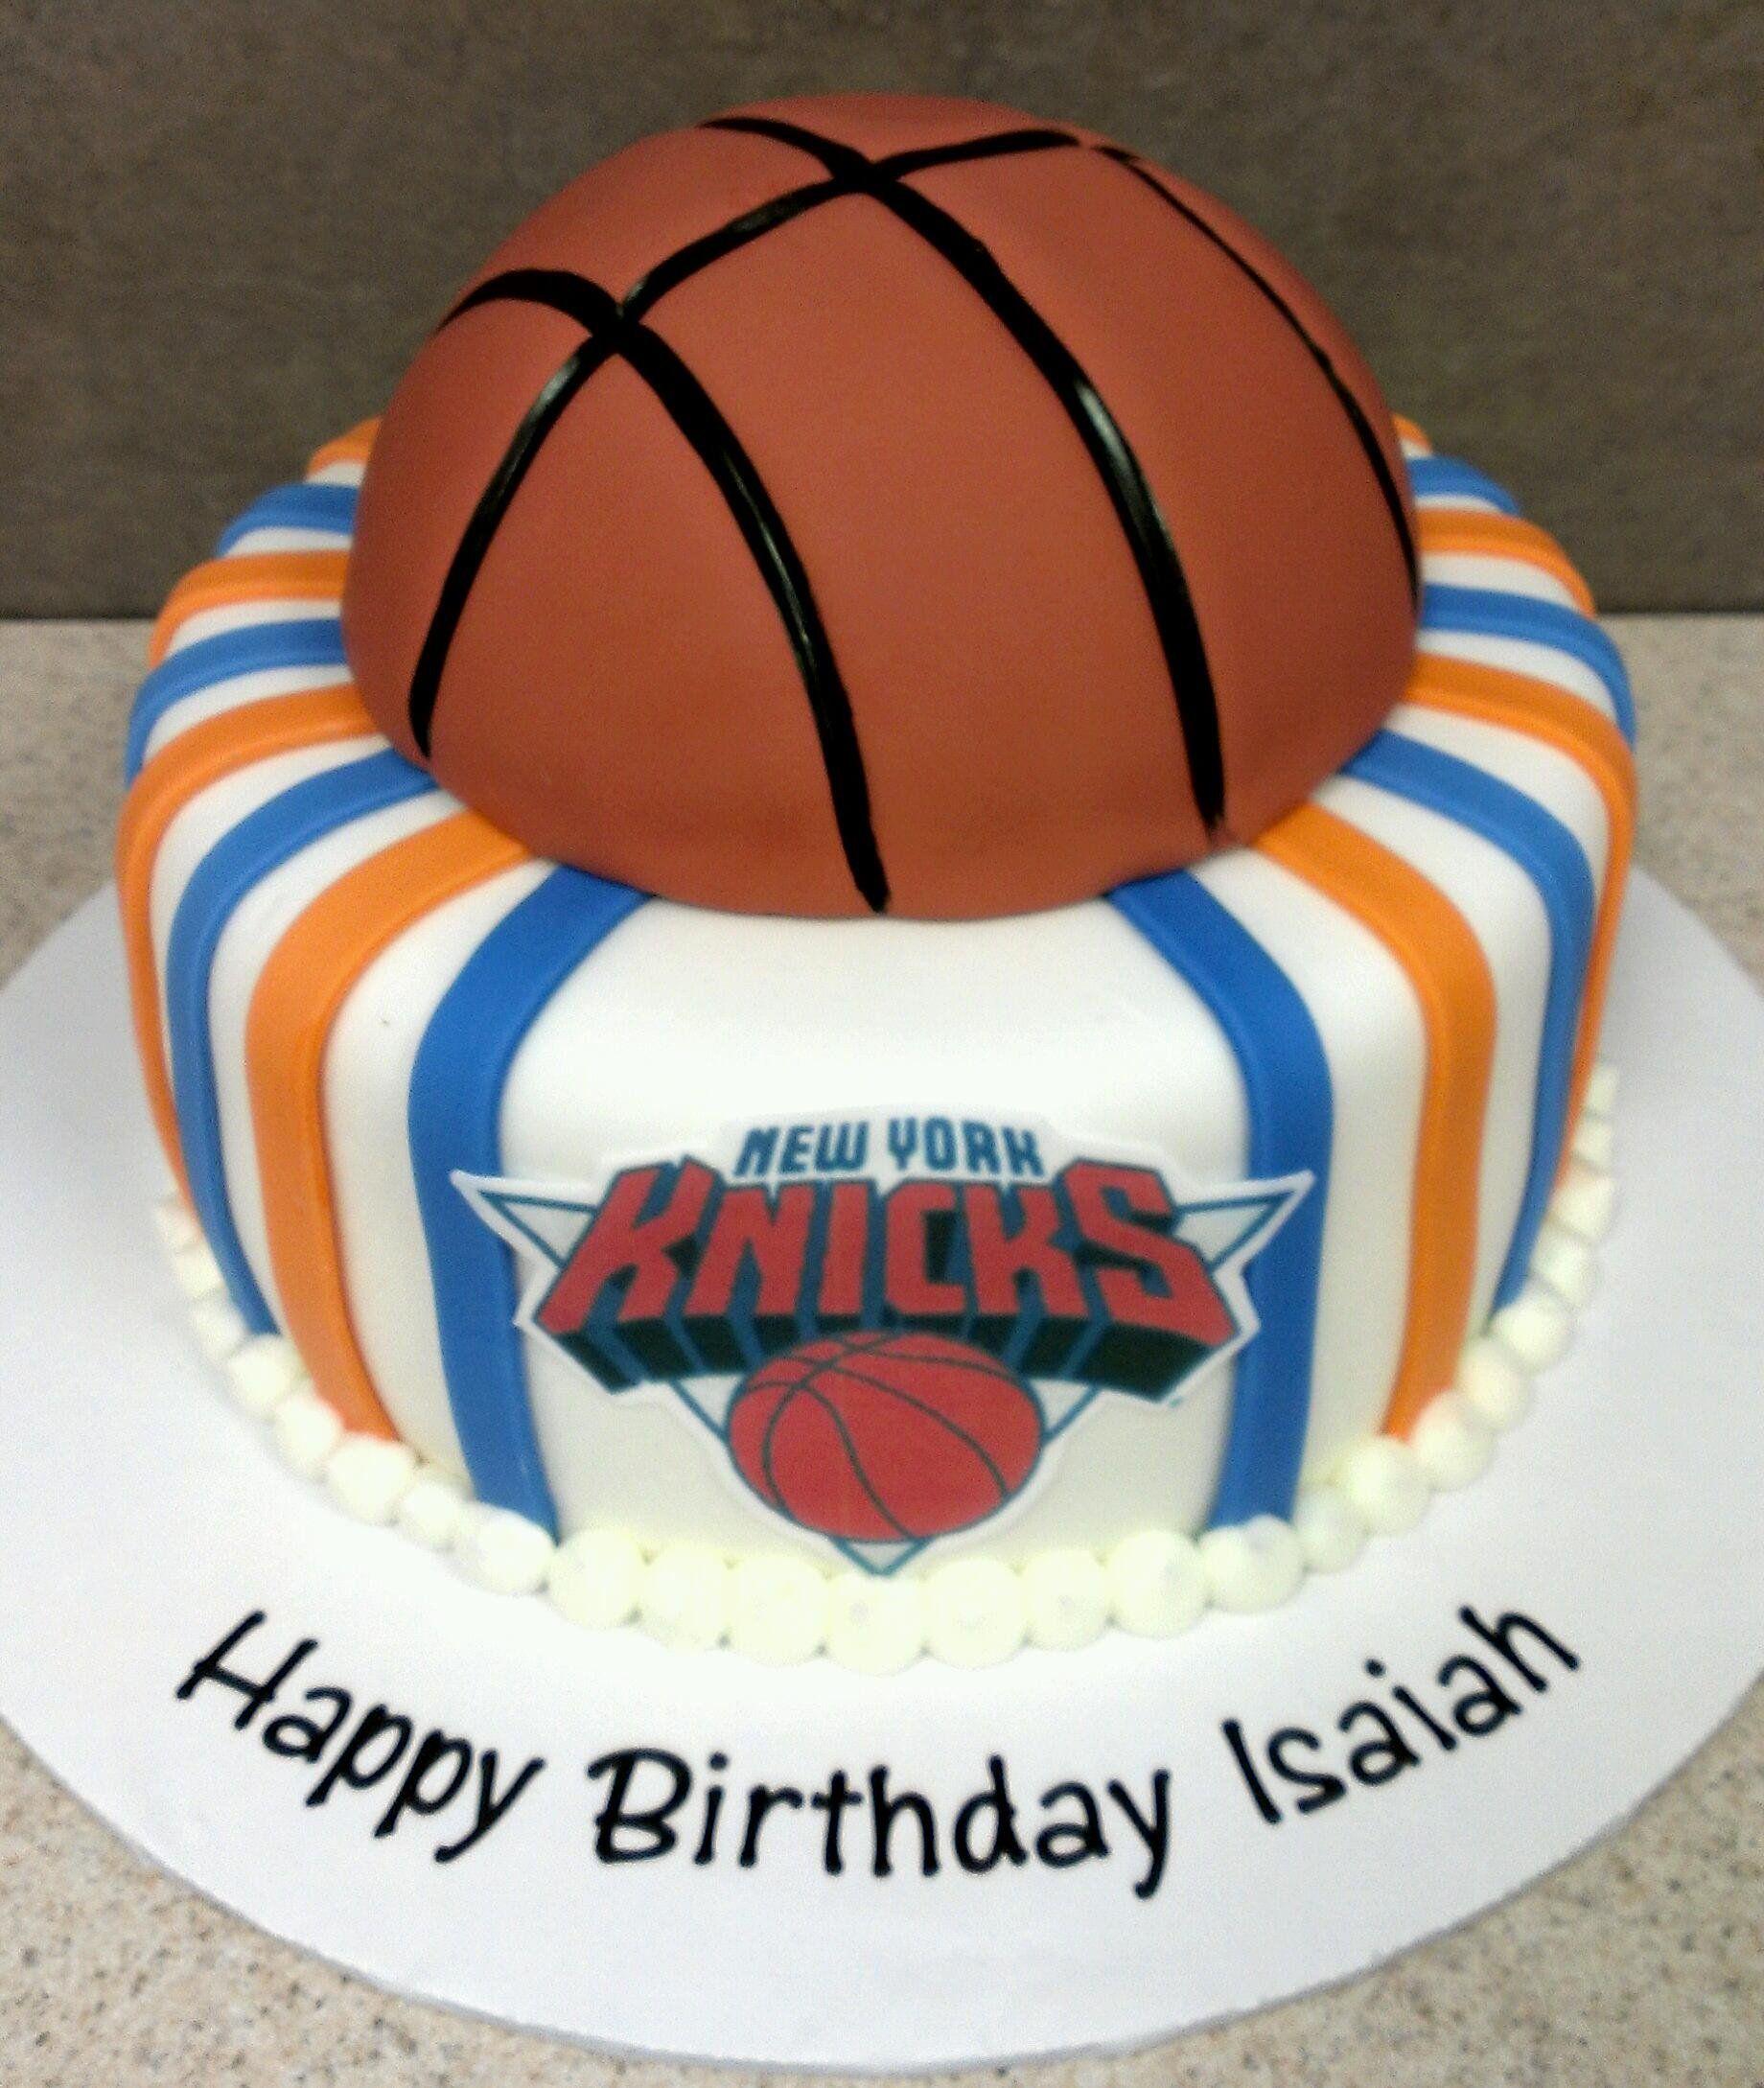 New York Knicks Birthday Cake Gateau Sport Gateau Anniversaire